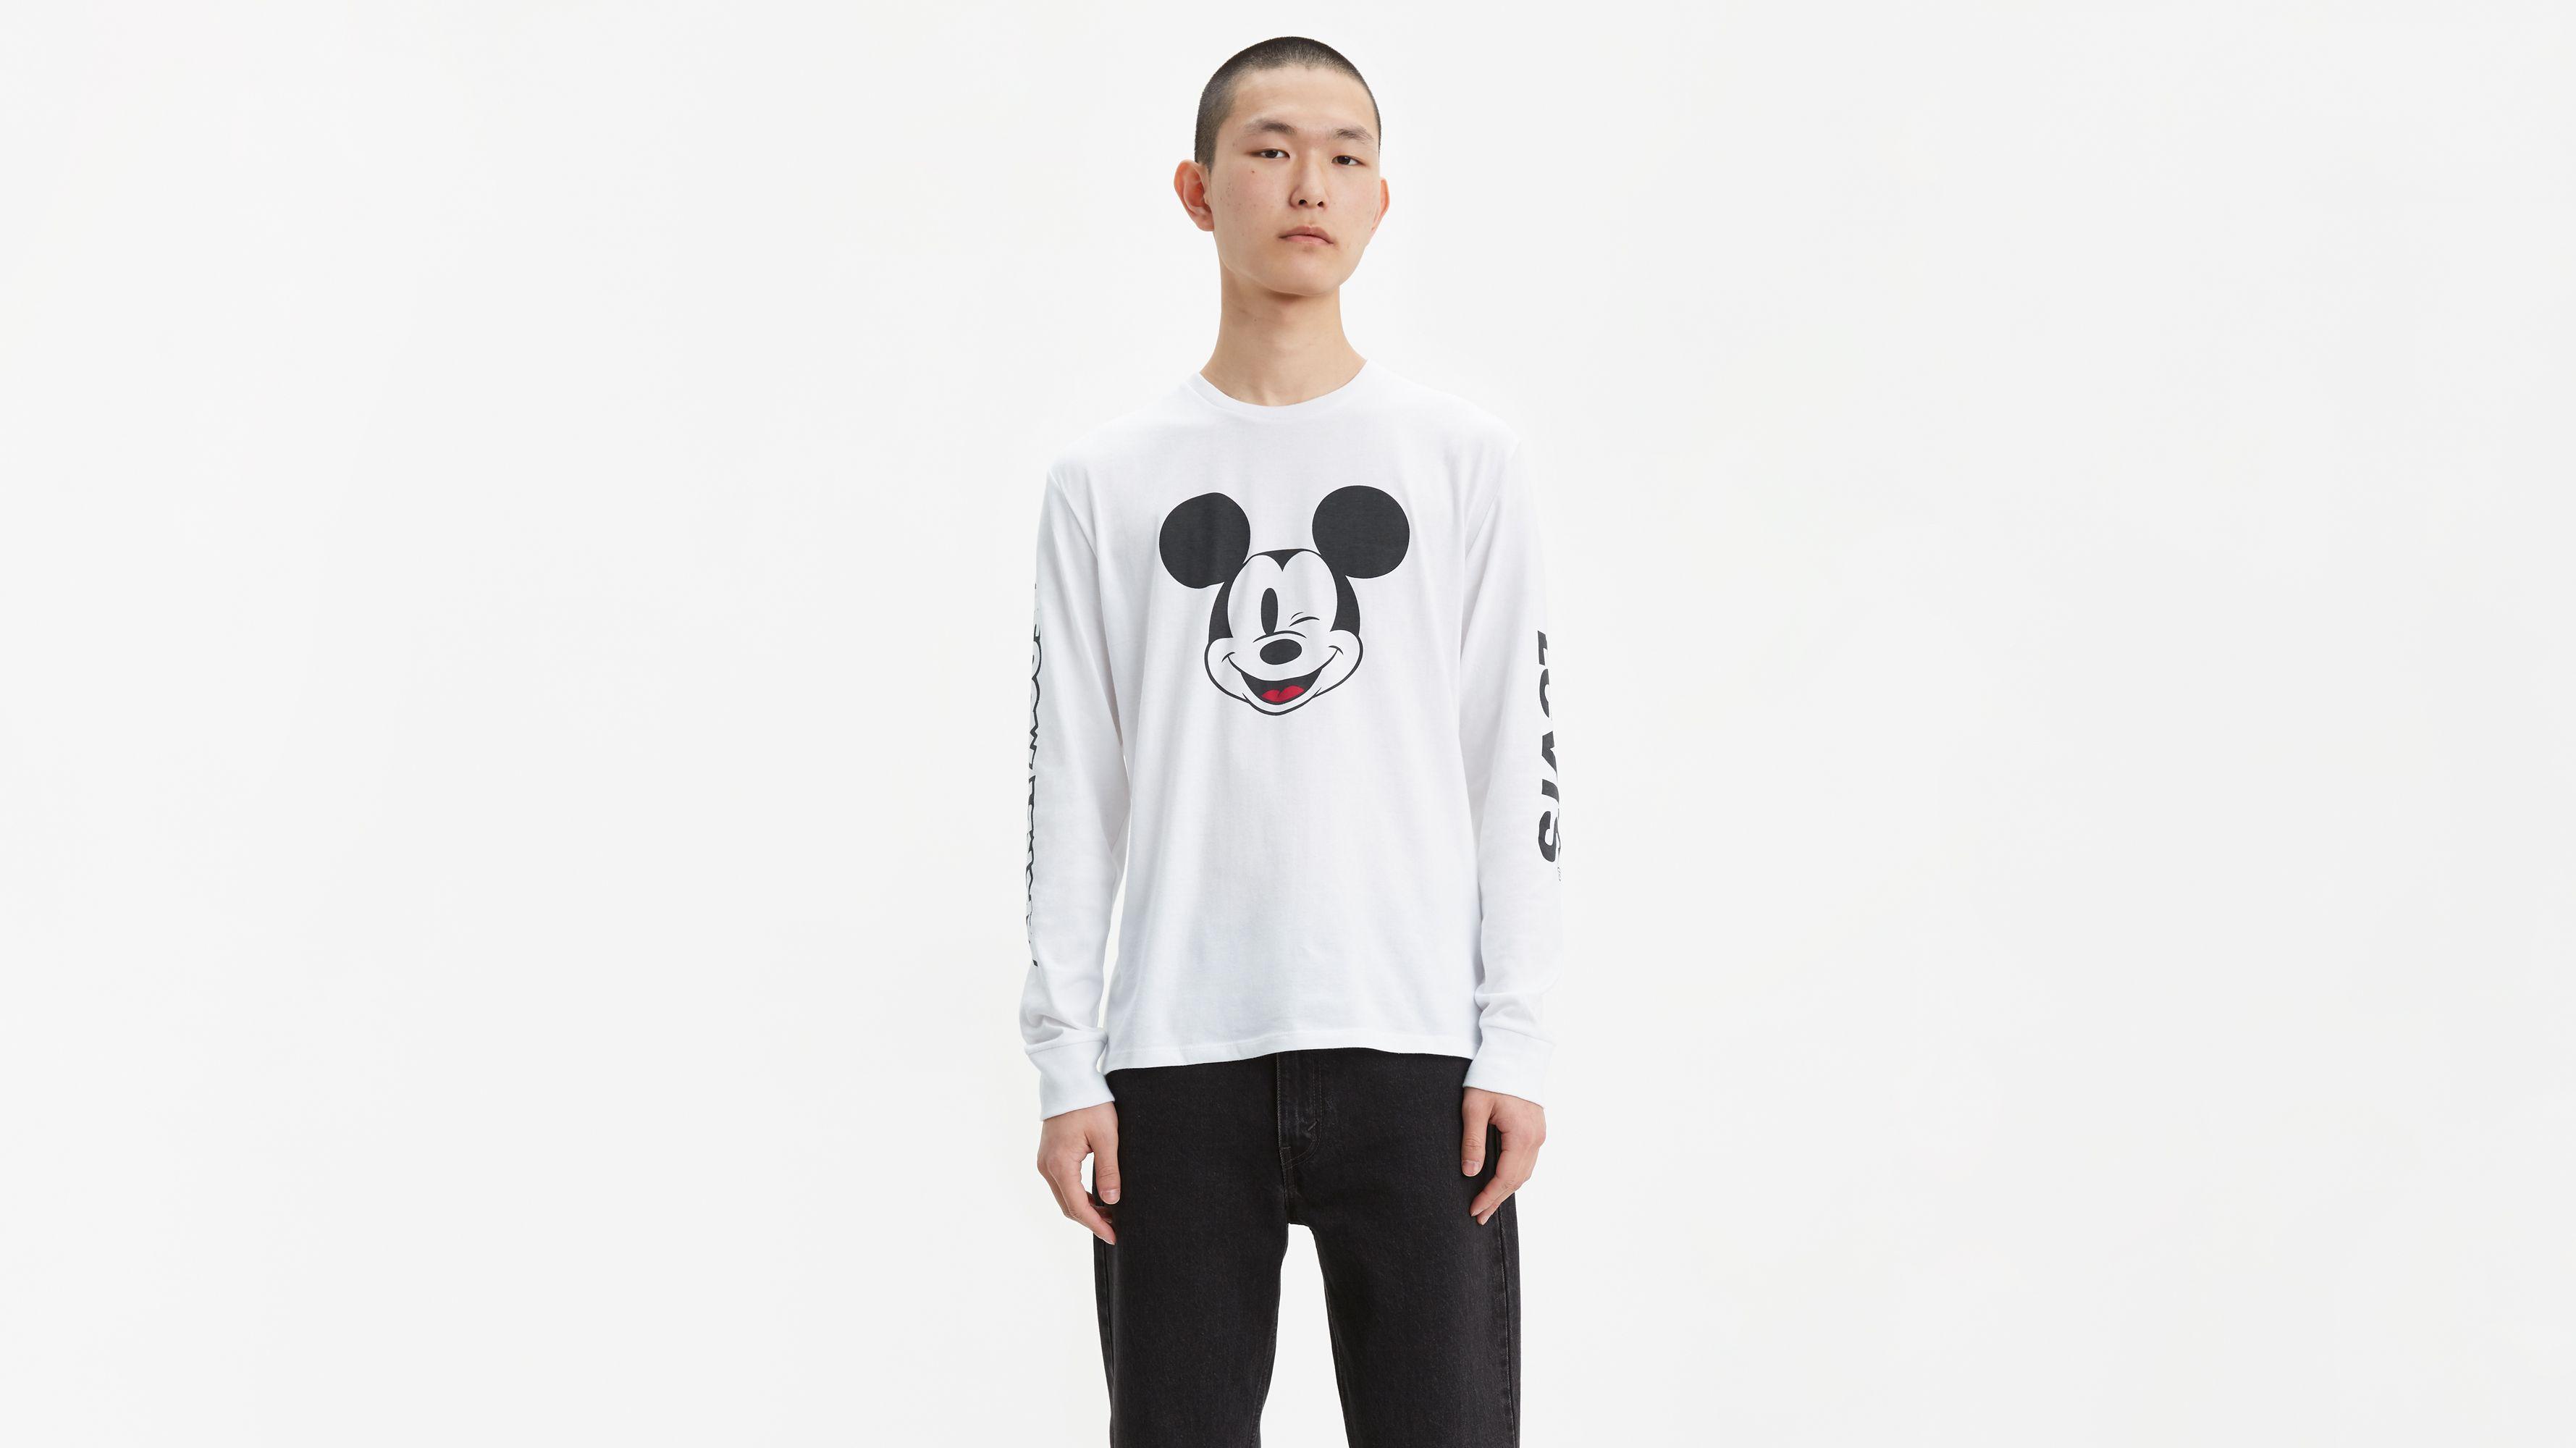 ShirtsJeansamp; Disney Us MoreLevi's® Mouse For Men Clothing Mickey WD2YIE9H